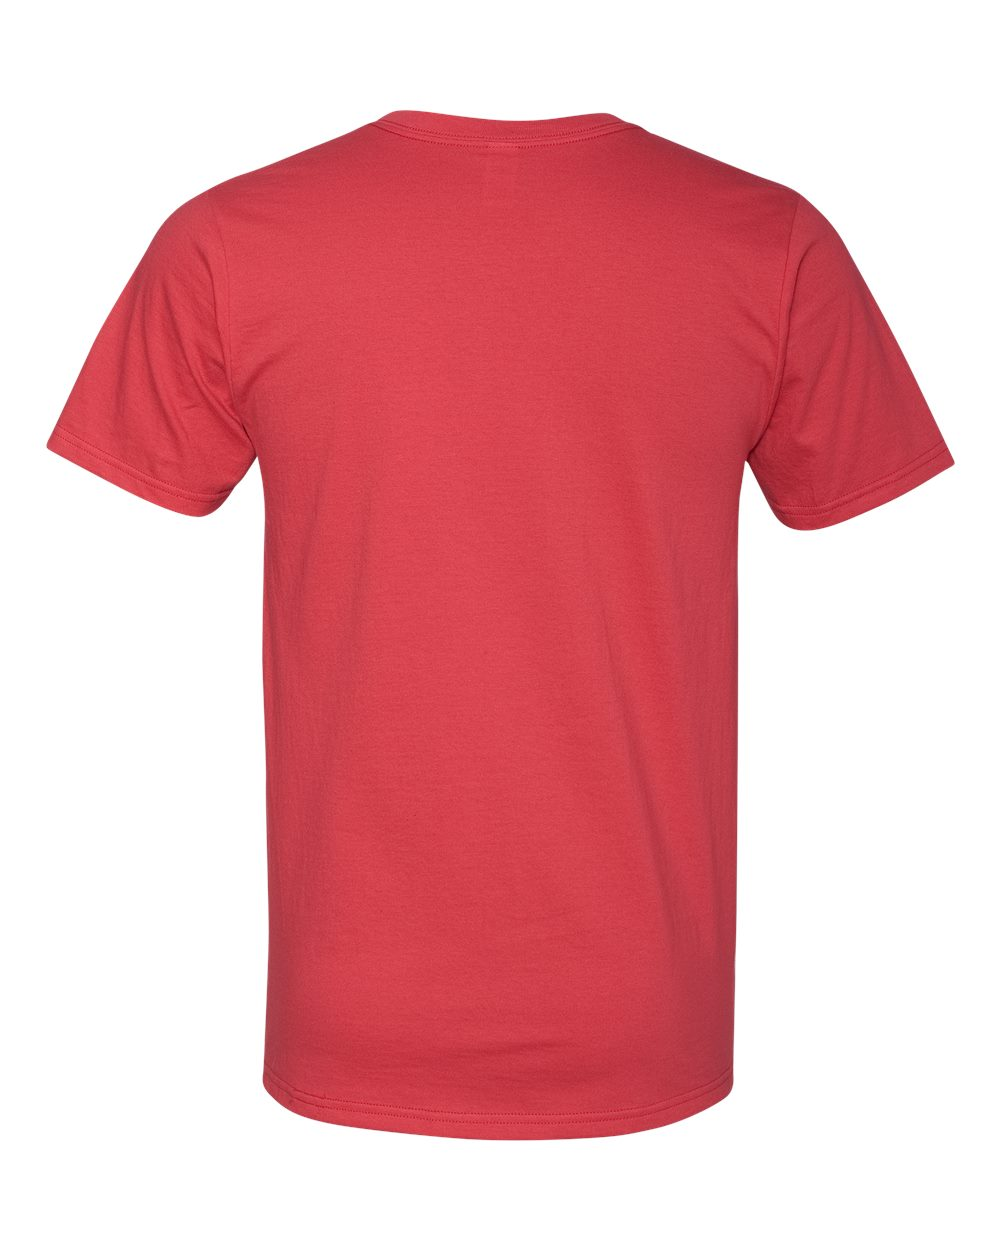 Anvil-Men-039-s-Lightweight-V-Neck-T-Shirt-982-S-3XL thumbnail 22